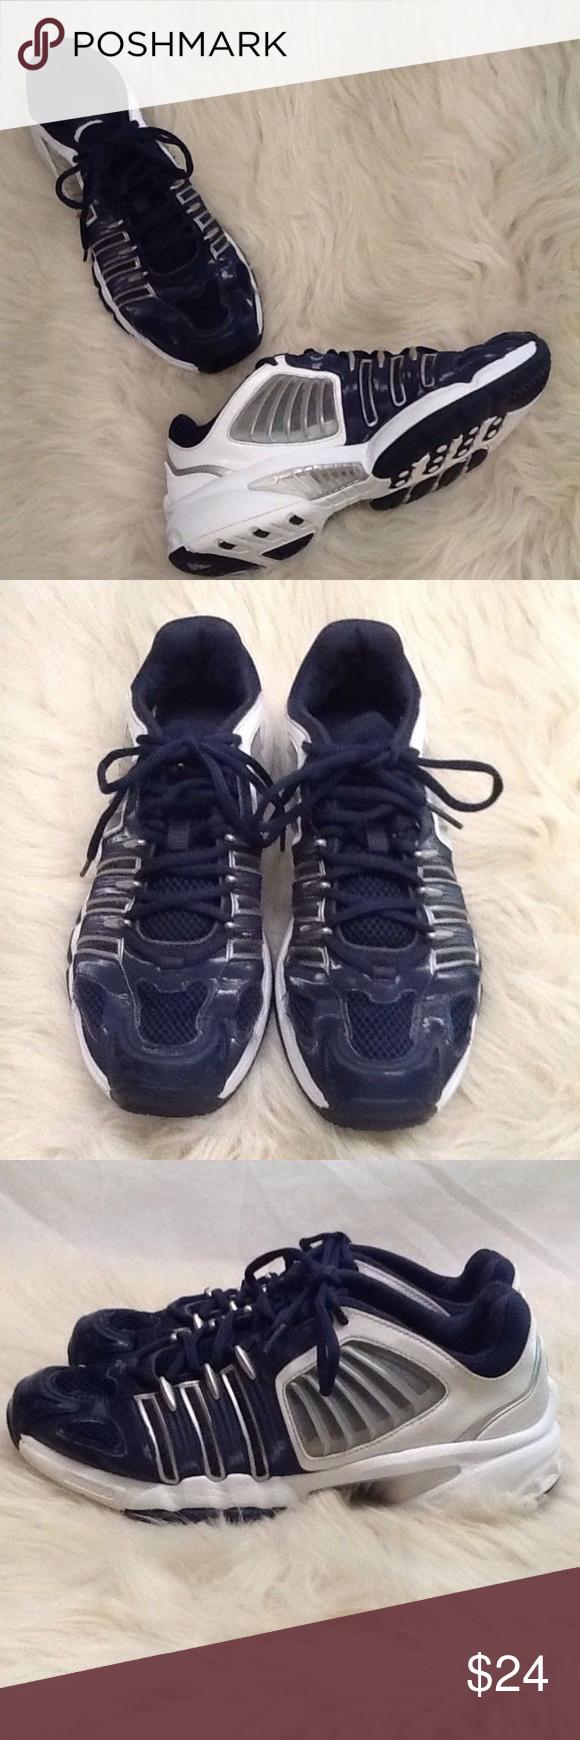 Adidas Adiprene Shoes Size 8.5 Climacool   Clothes design, Blue ...